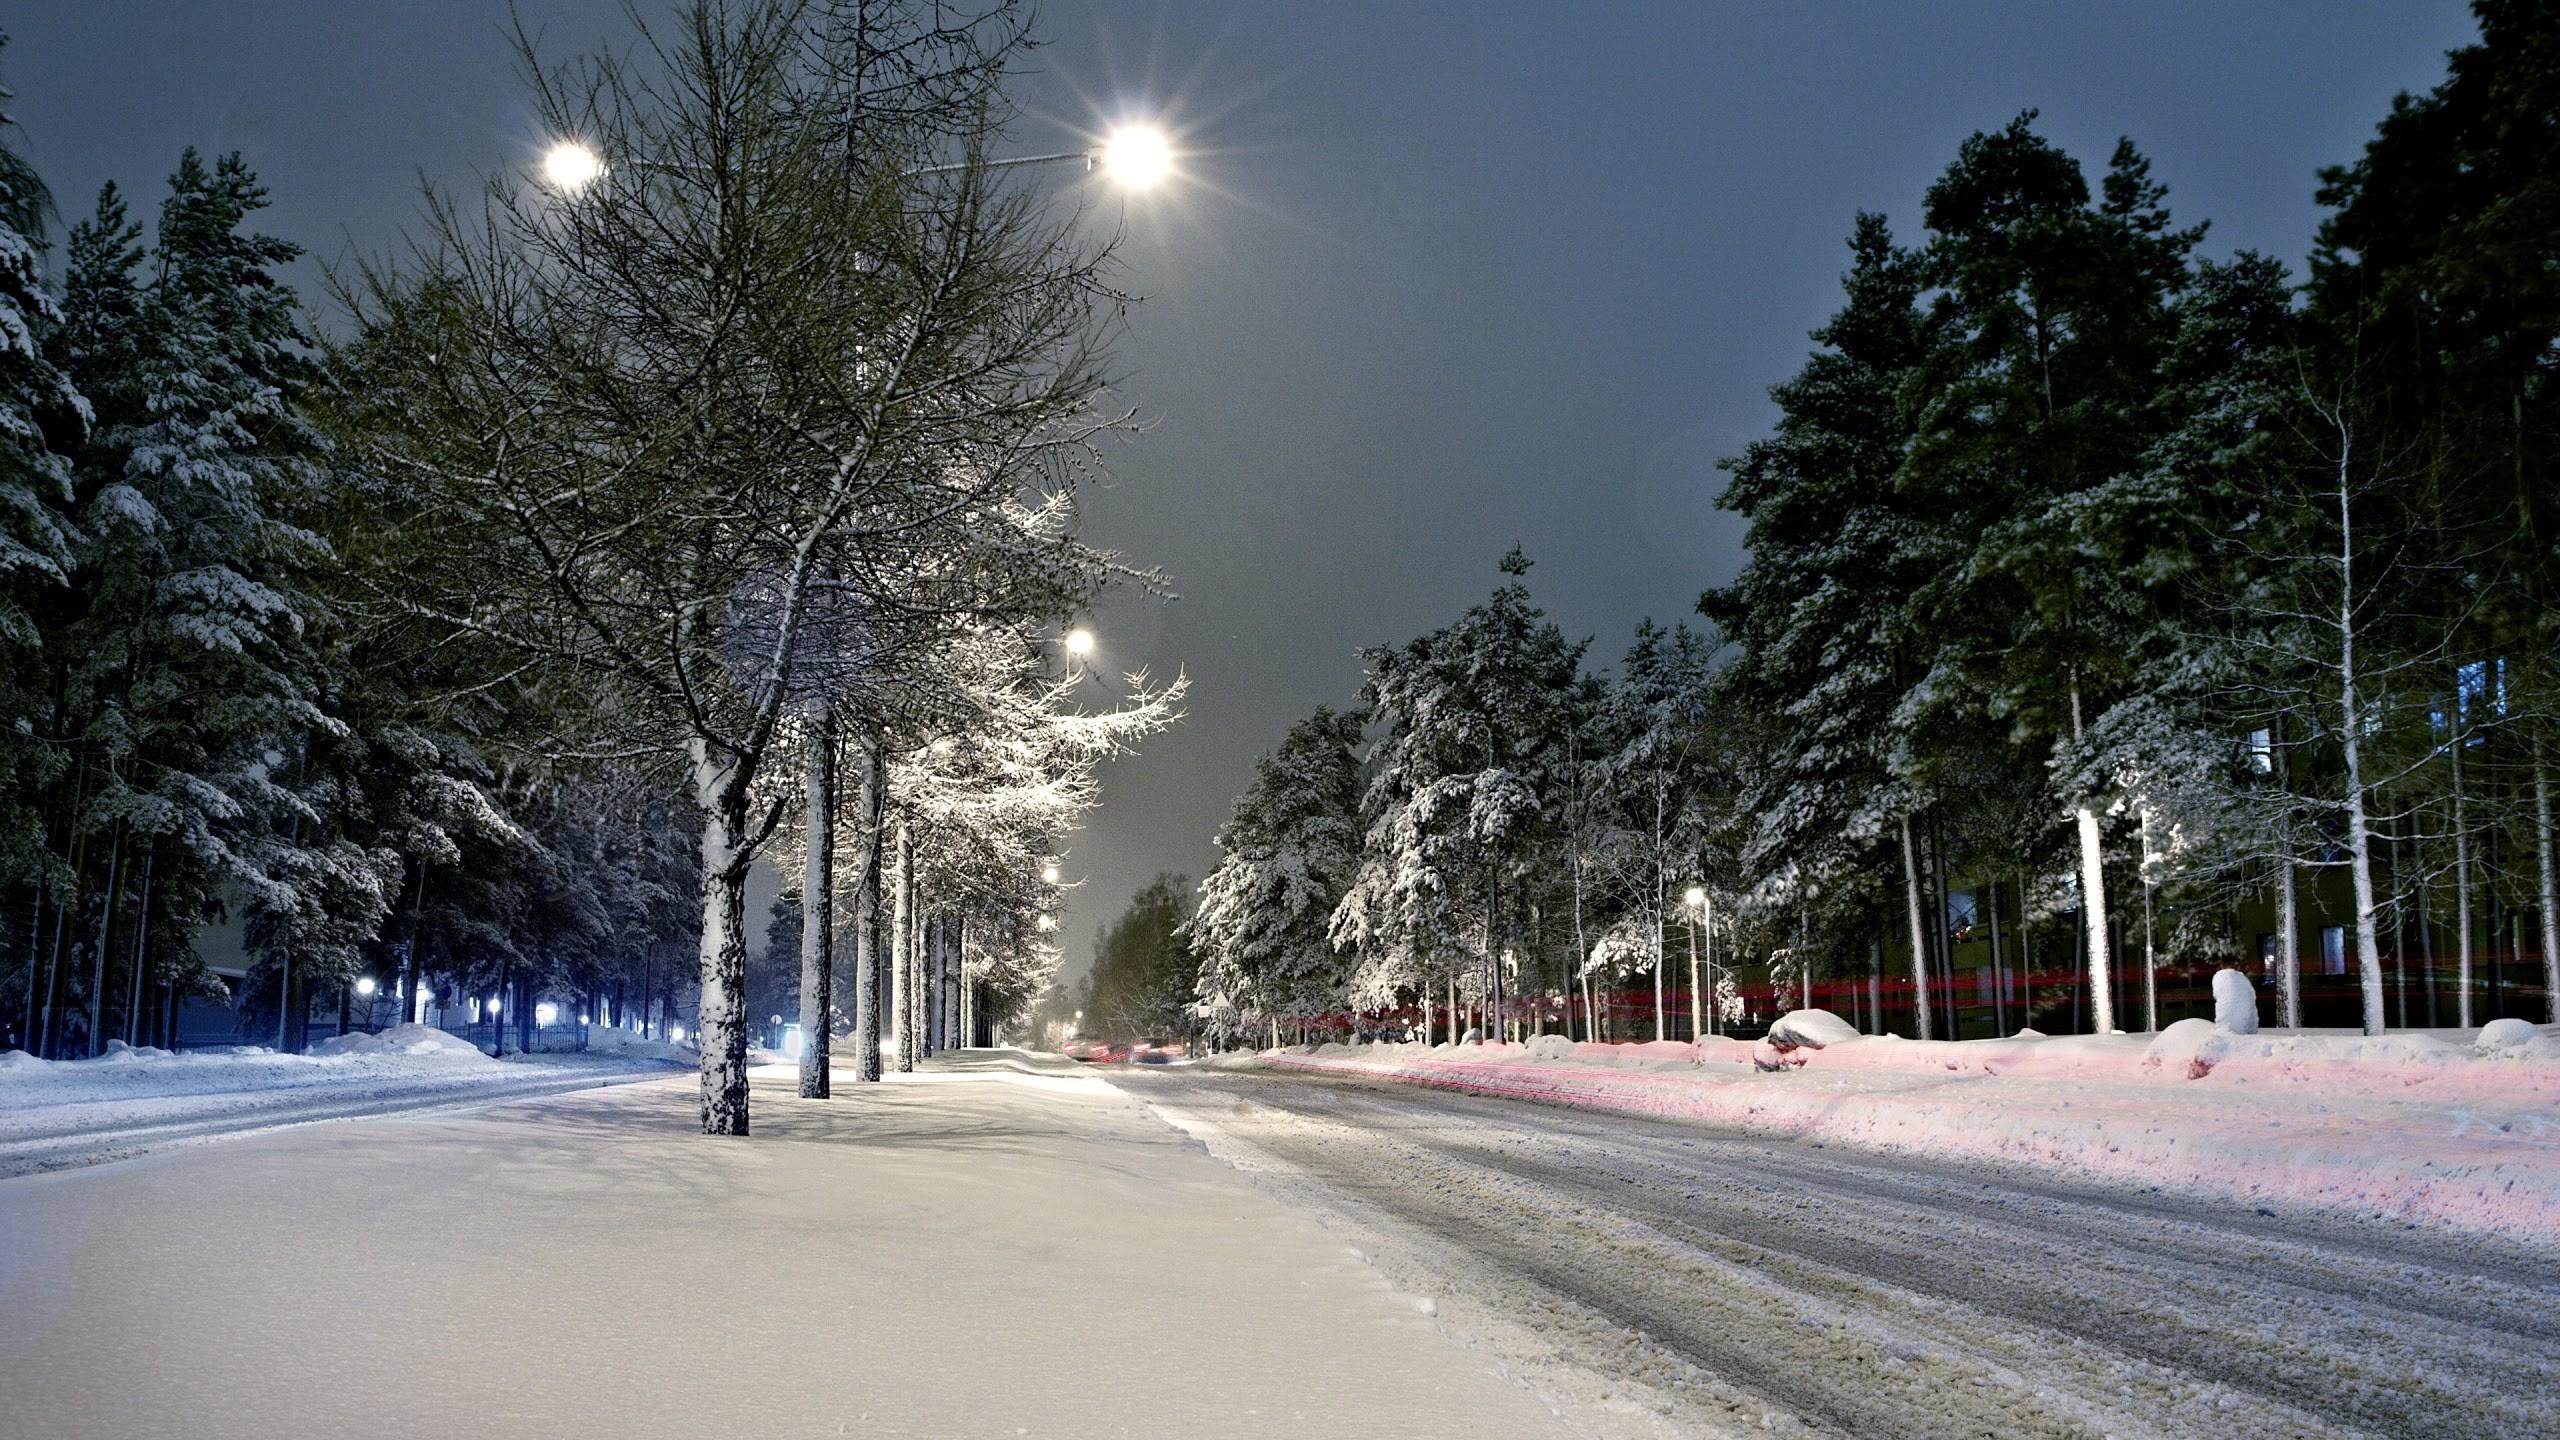 Wallpaper: Street Lights Winter Snow Scenery